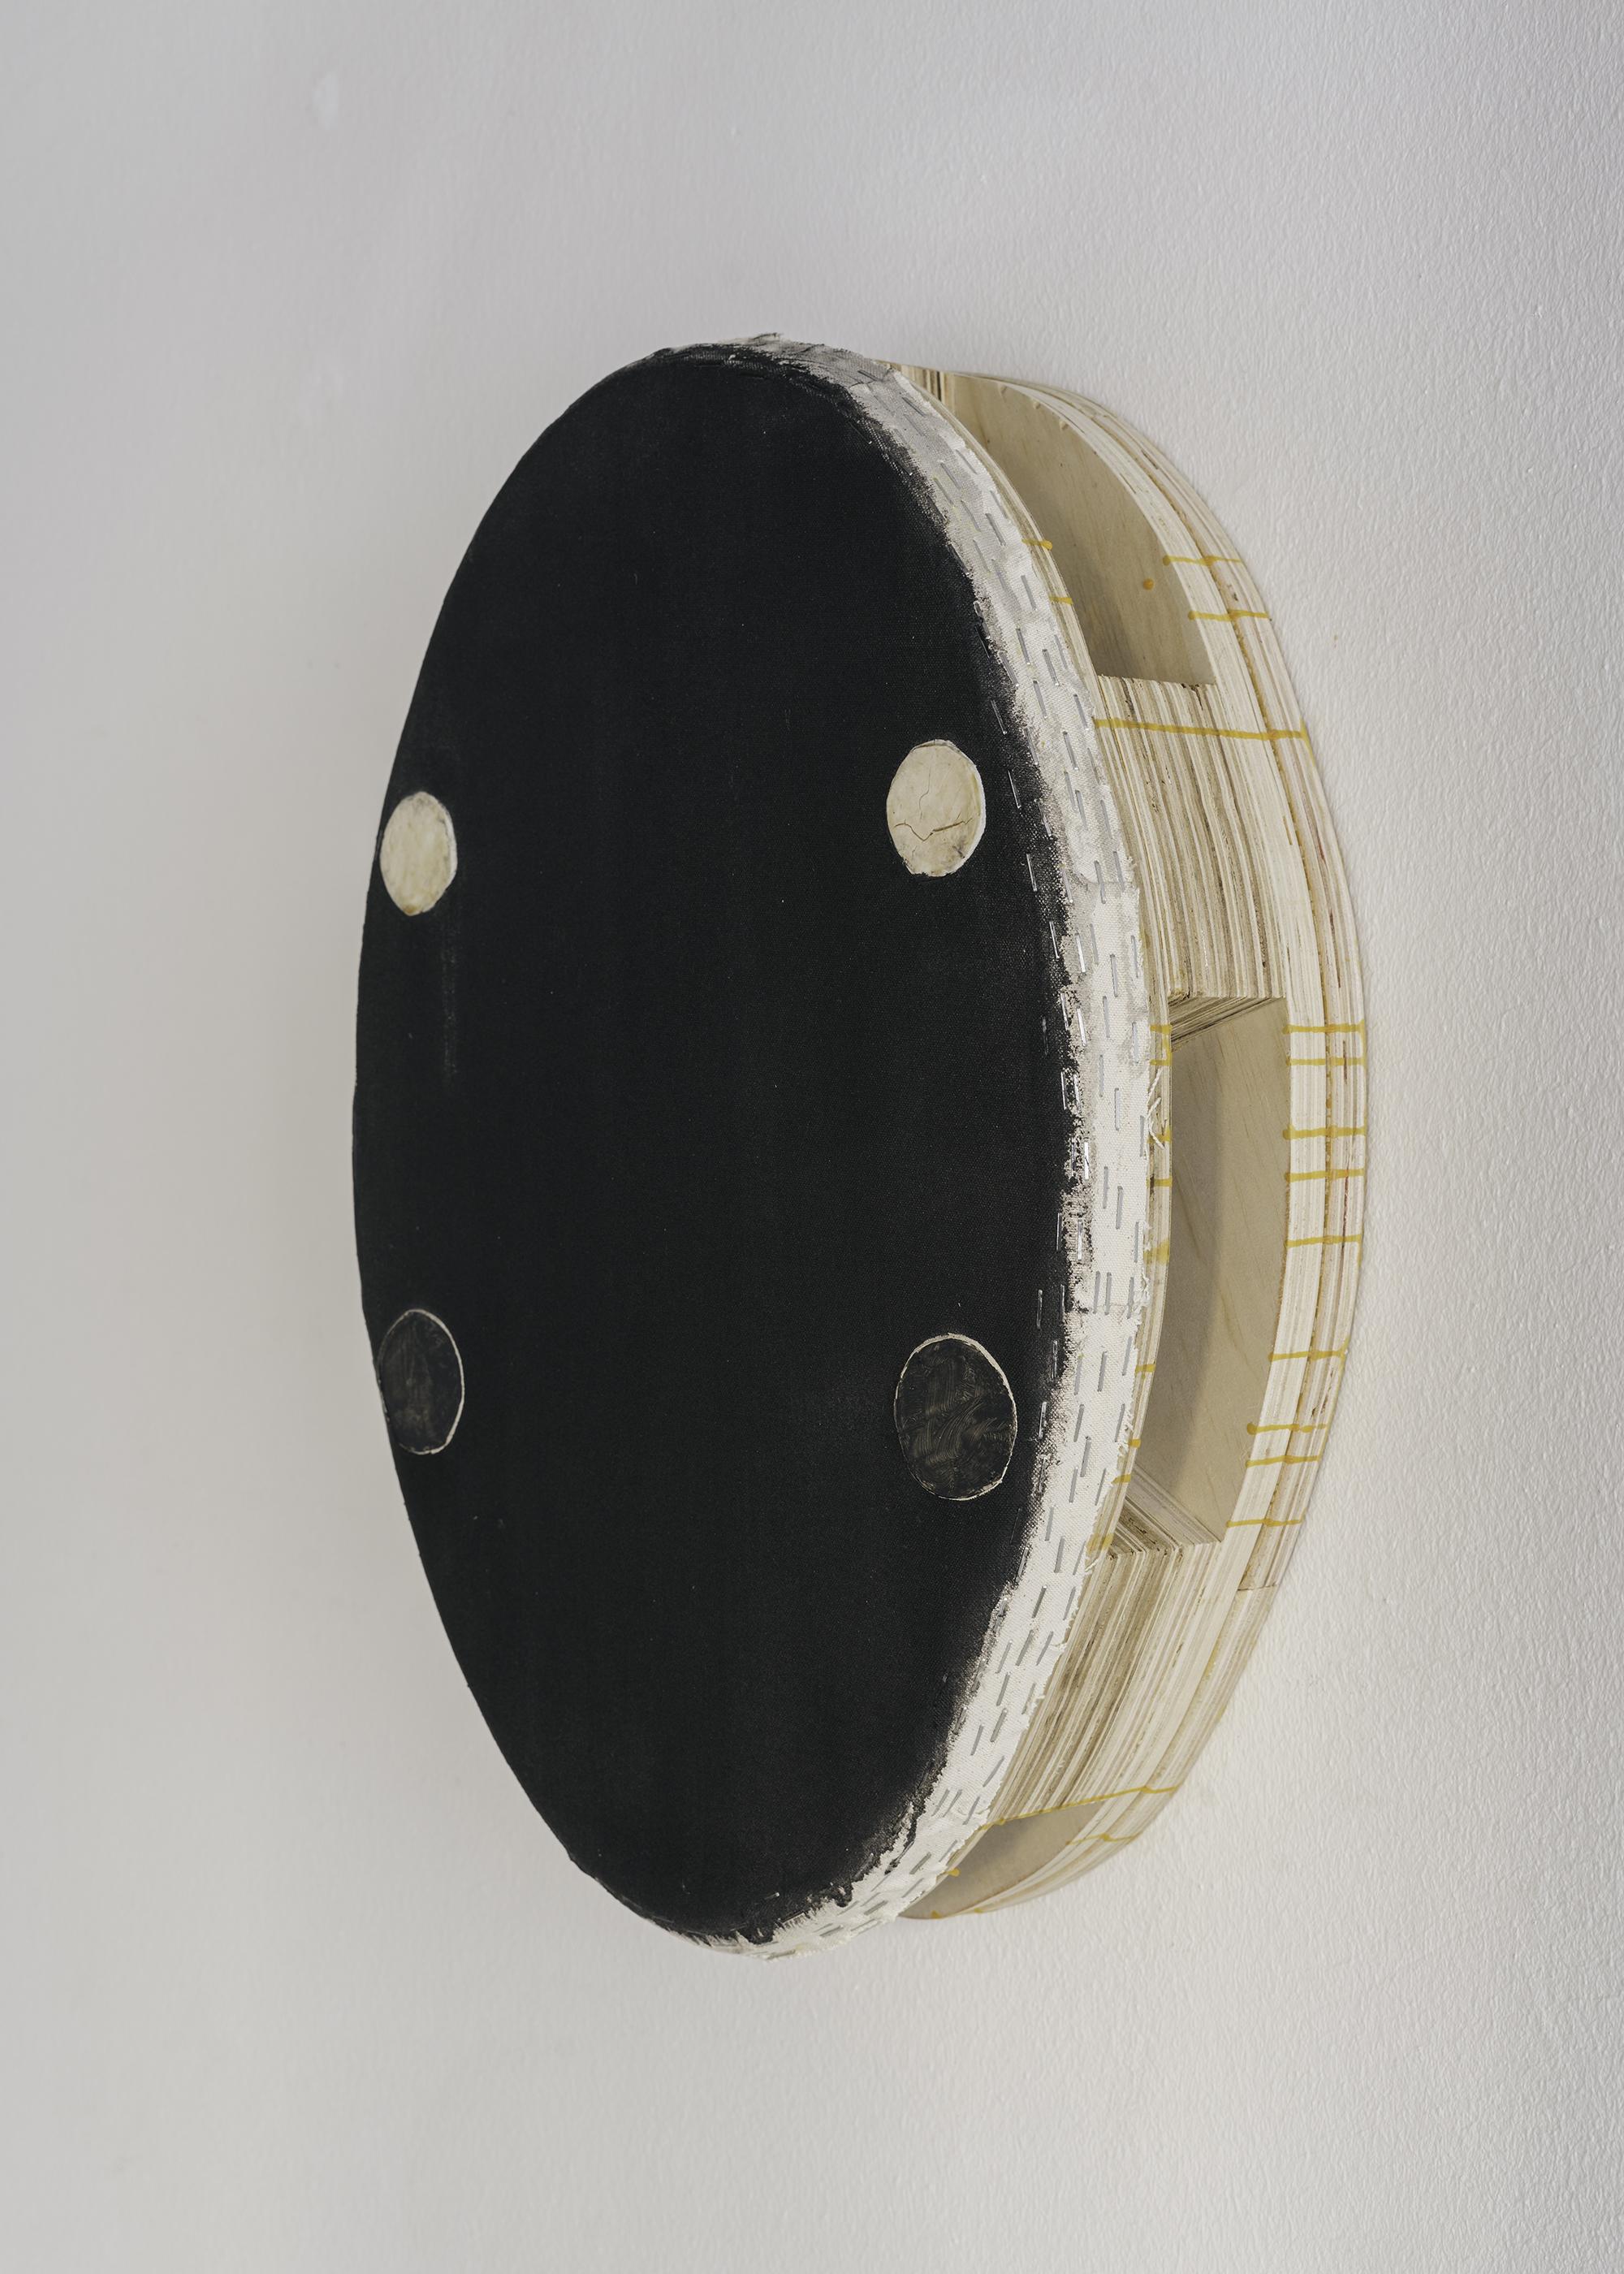 6 Otis Jones - 2021 - Acrylic on linen on wood 53 CM x 37,5 CM x 13.5 CM